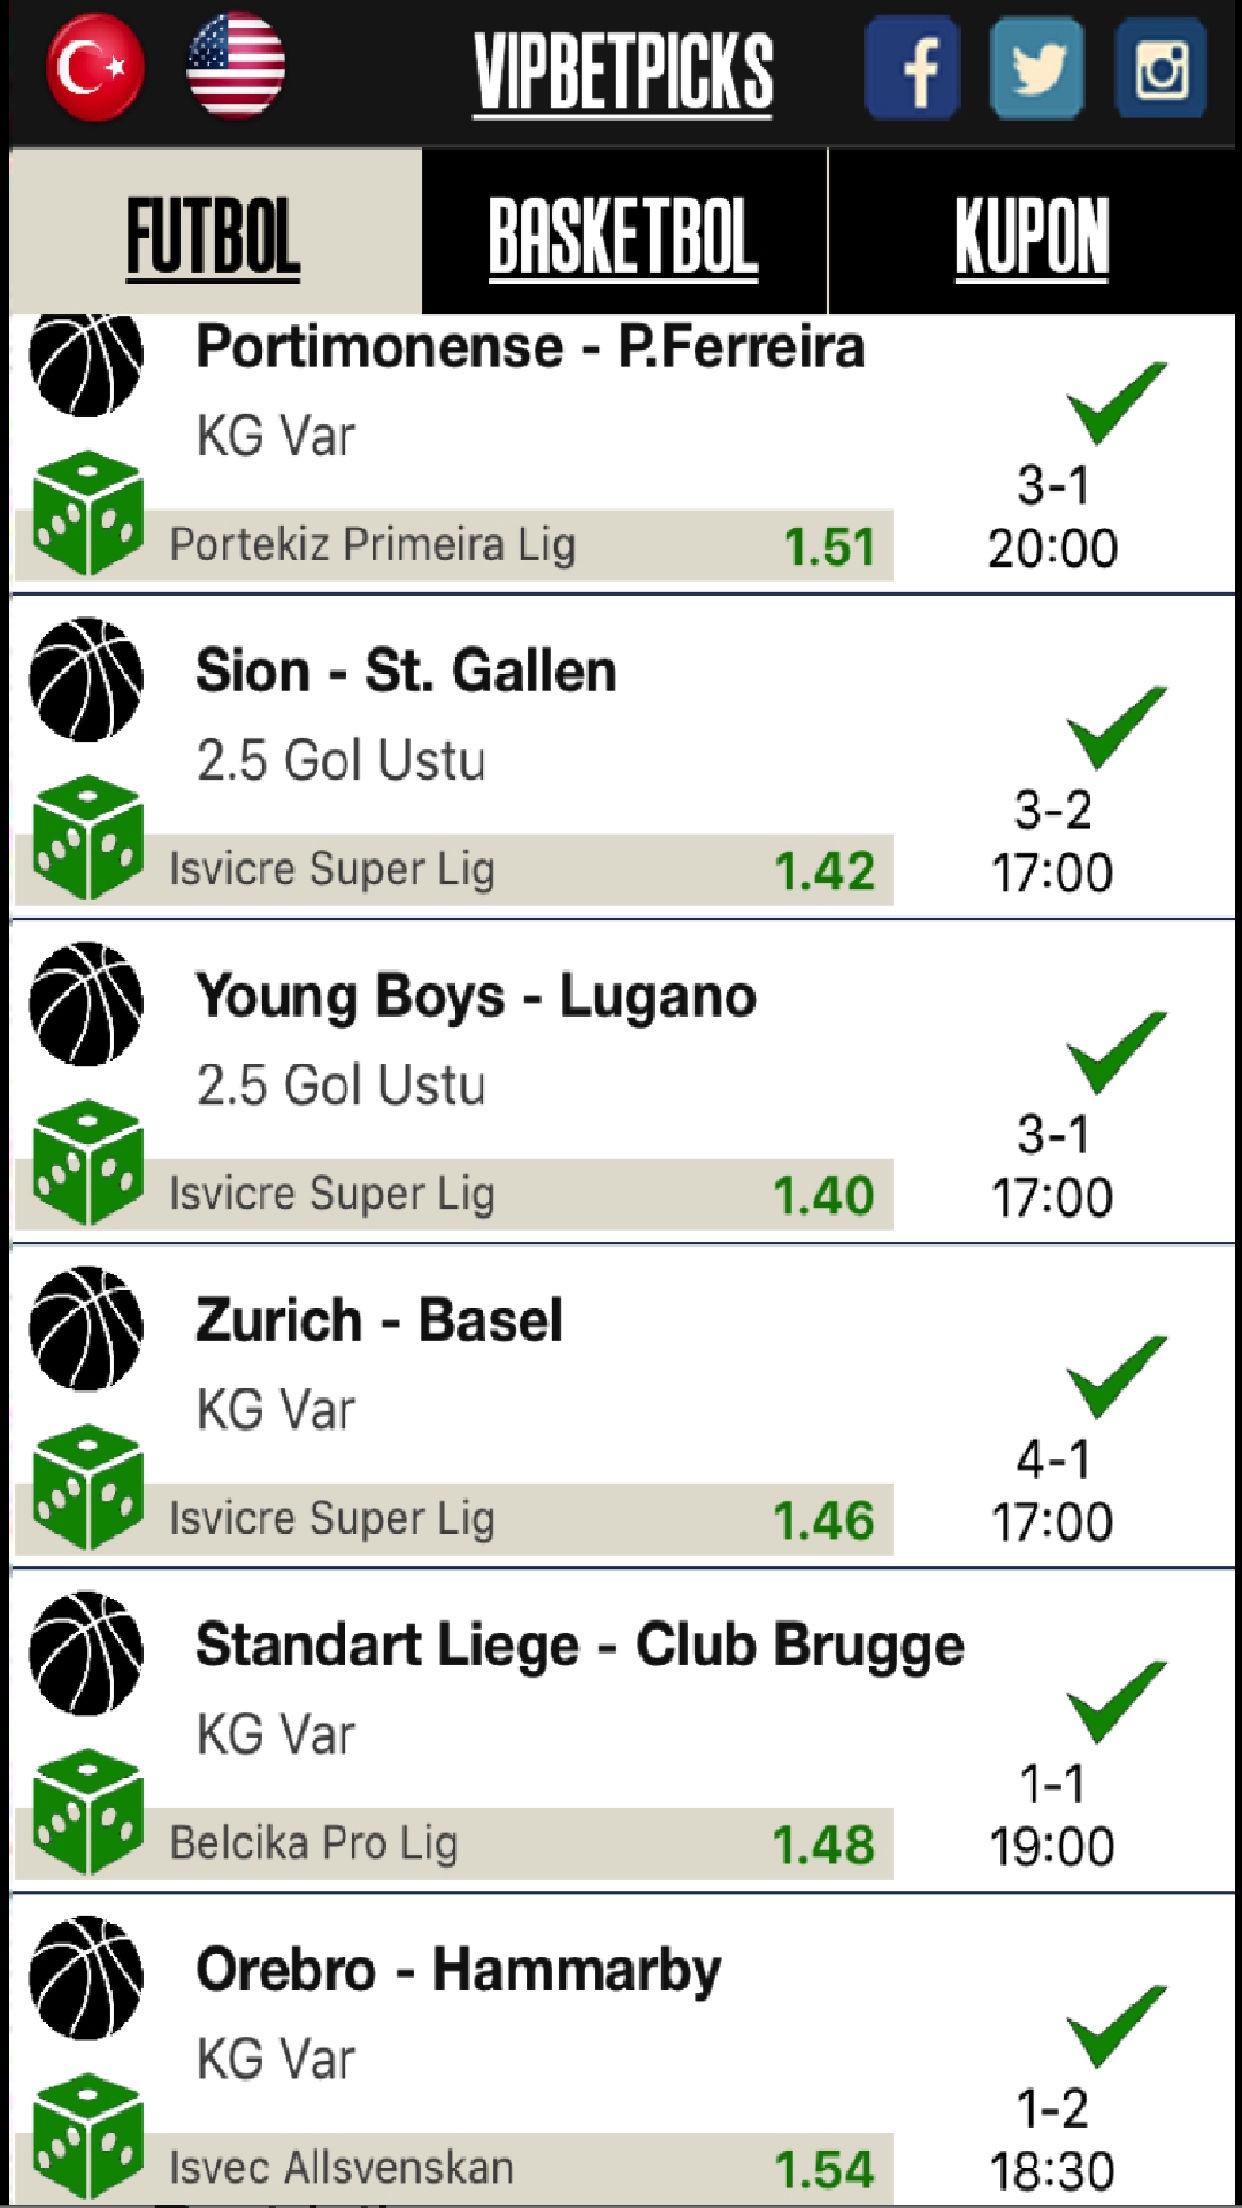 VIP BETTING PICKS - Sports Bet Screenshot